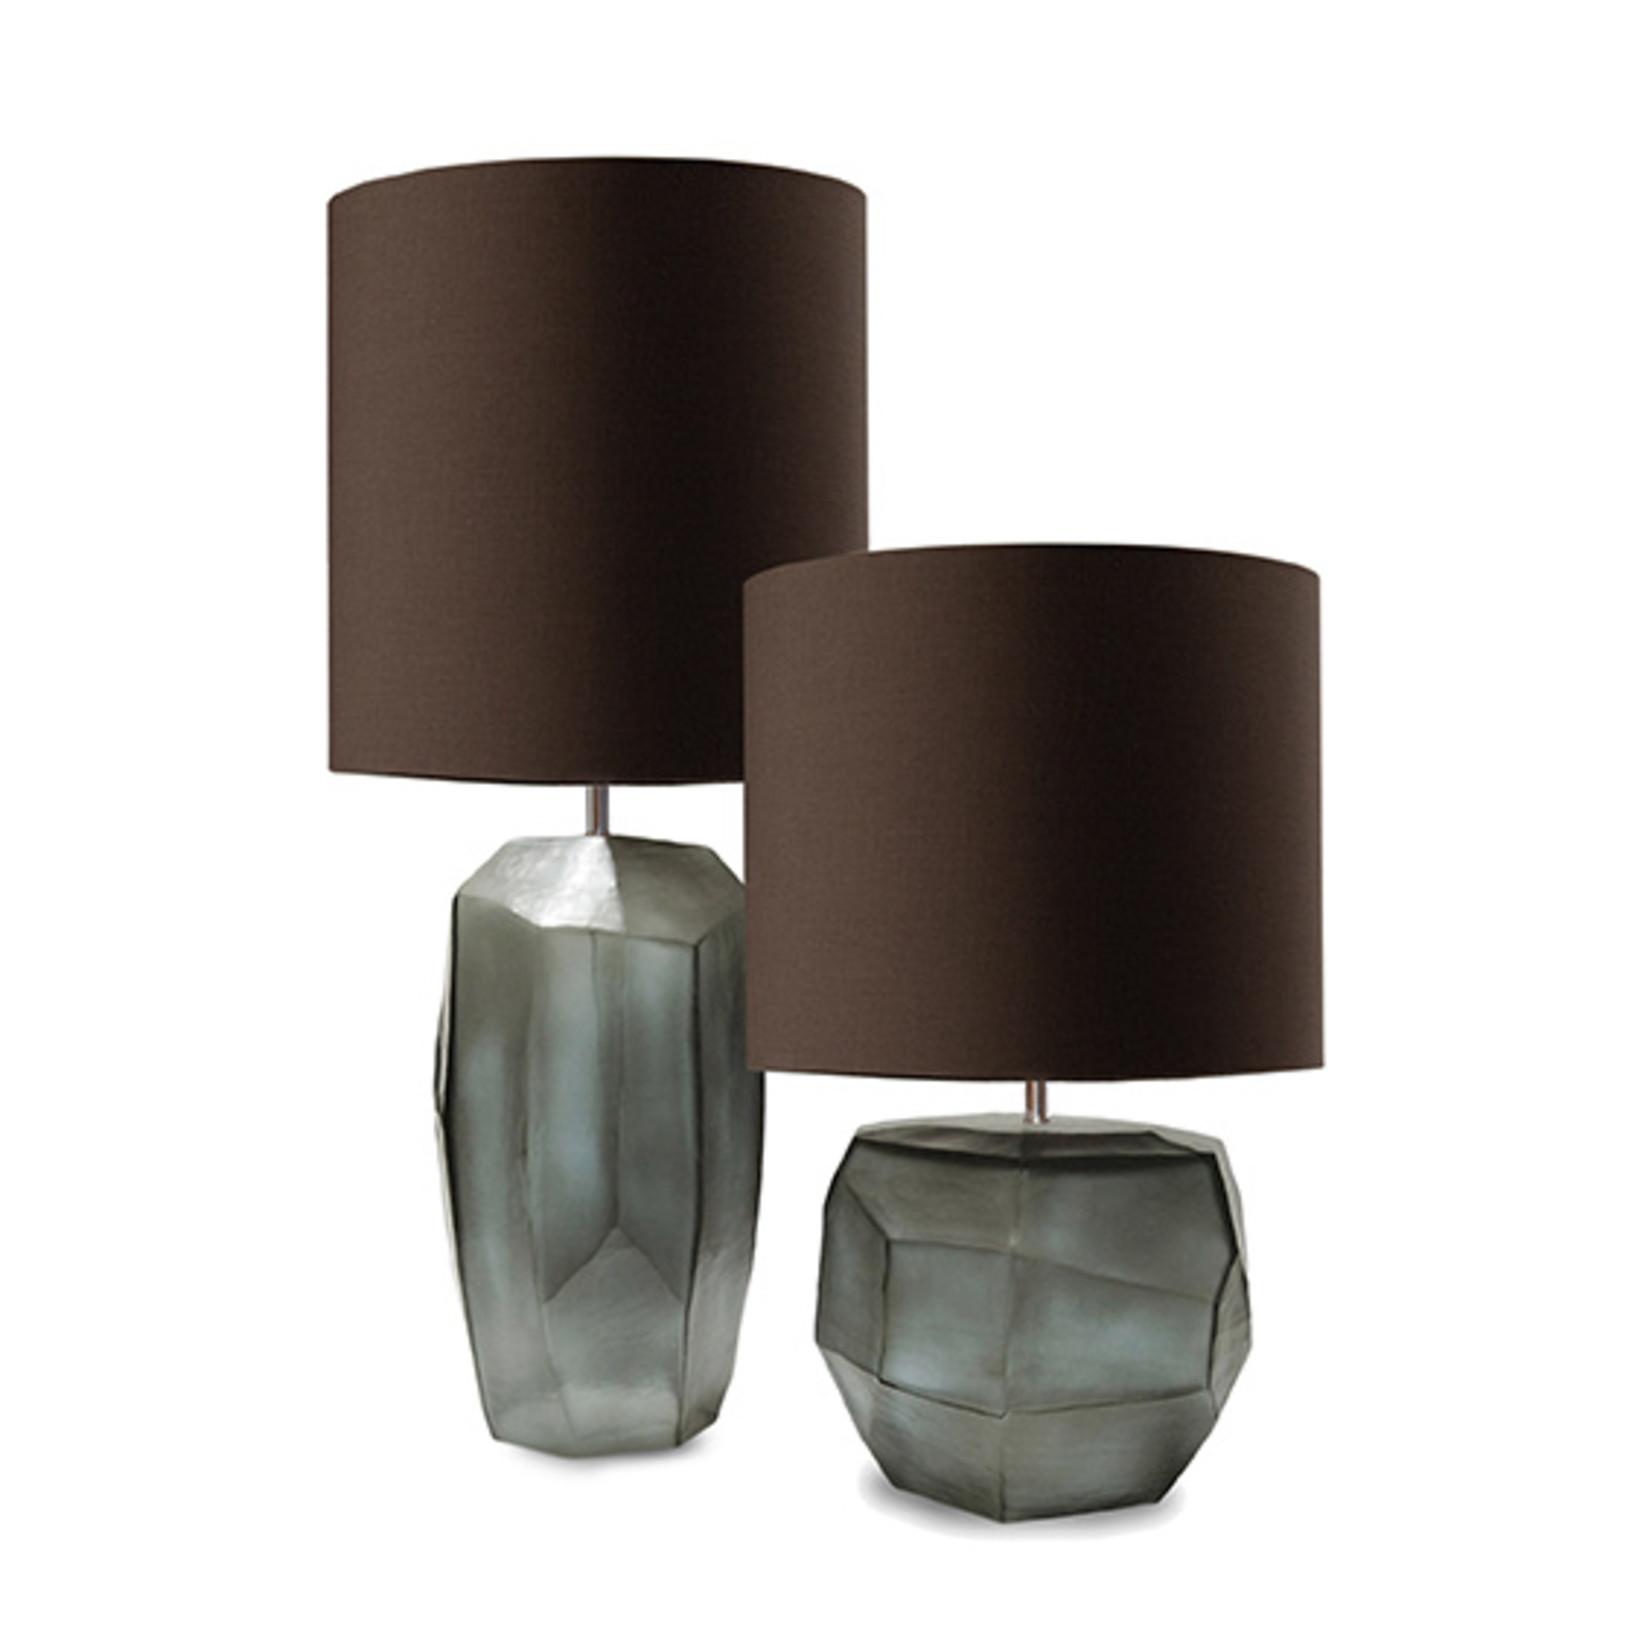 Guaxs Table lamp Cubistic Round | Indigo / Smokegrey